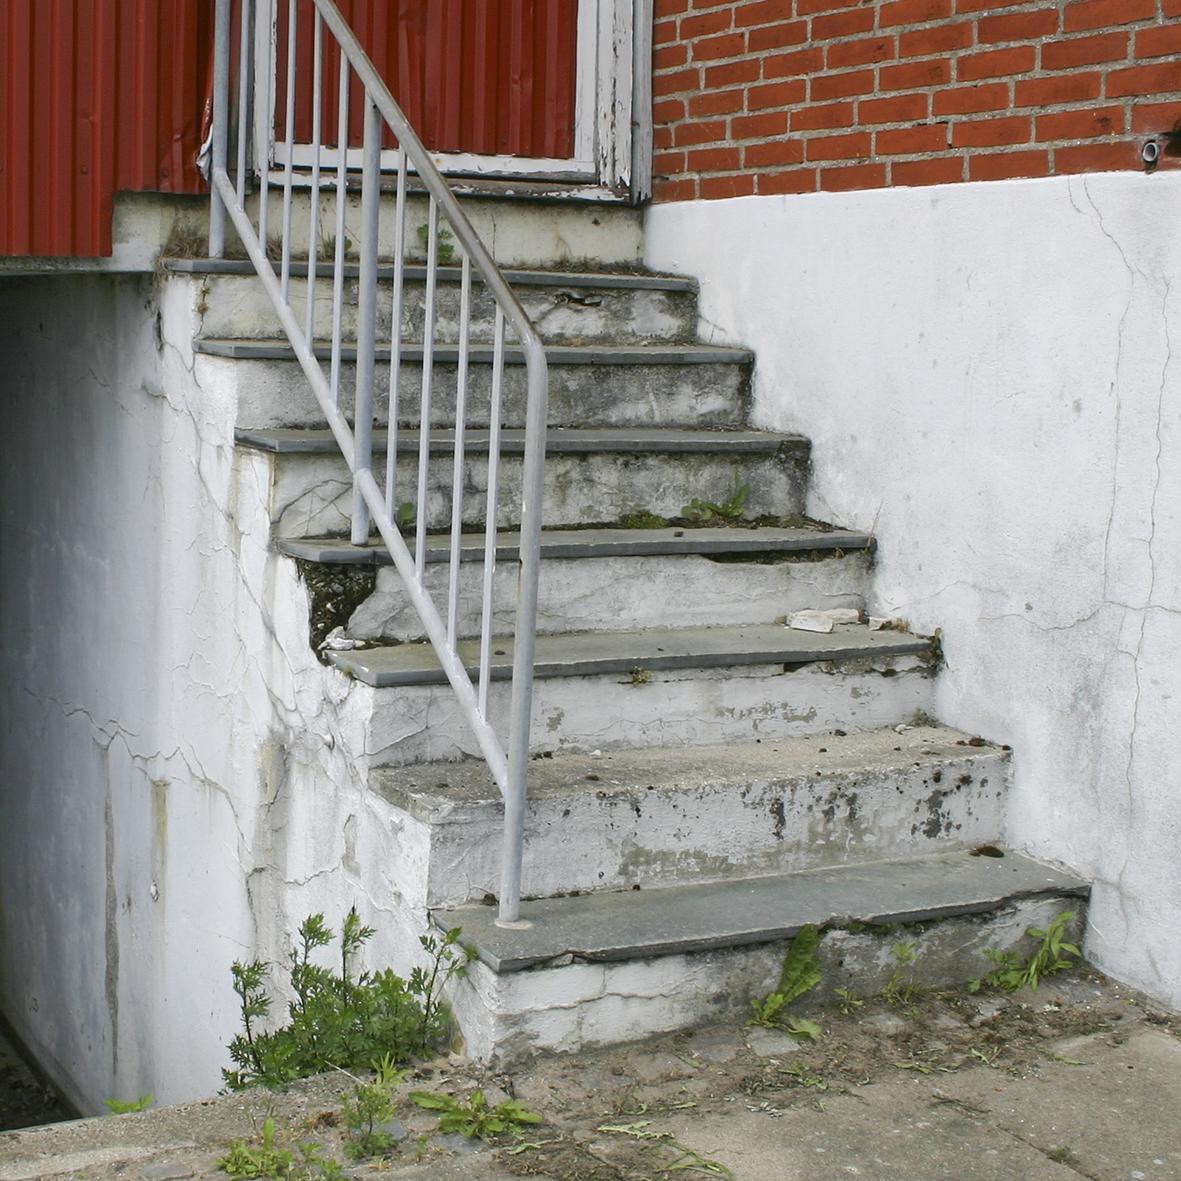 Trappe Med Flisetrin Skalflex Facadebehandling Skalflex Dk